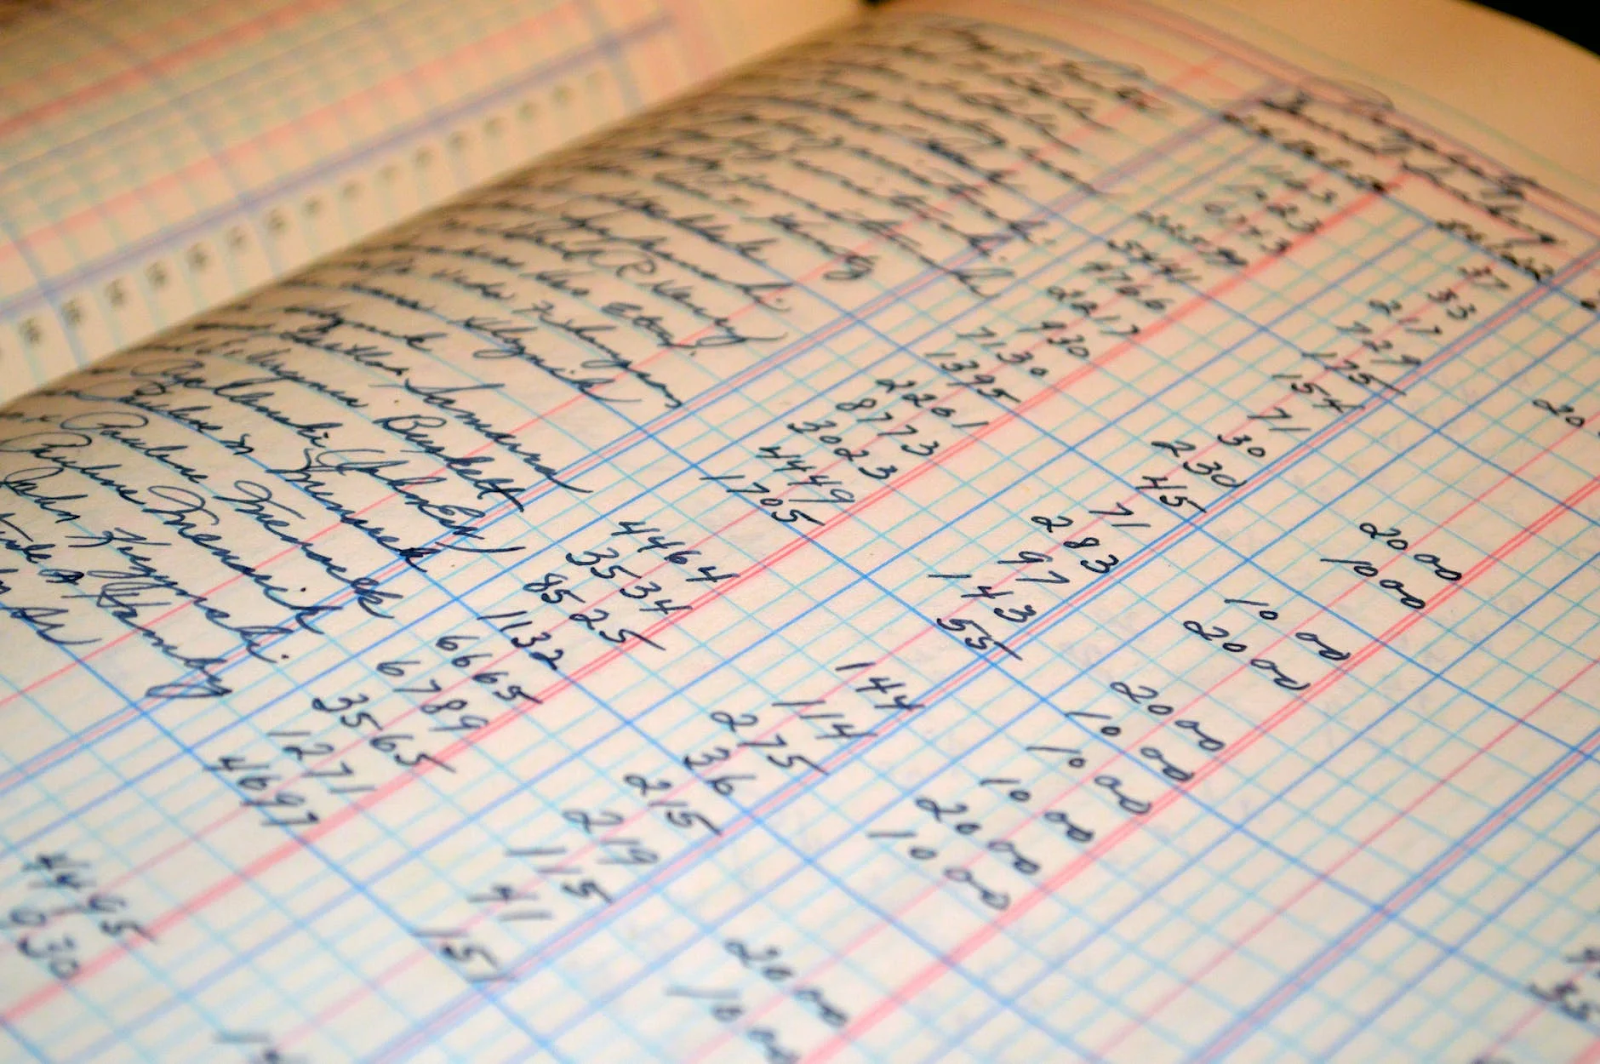 Tax documentation